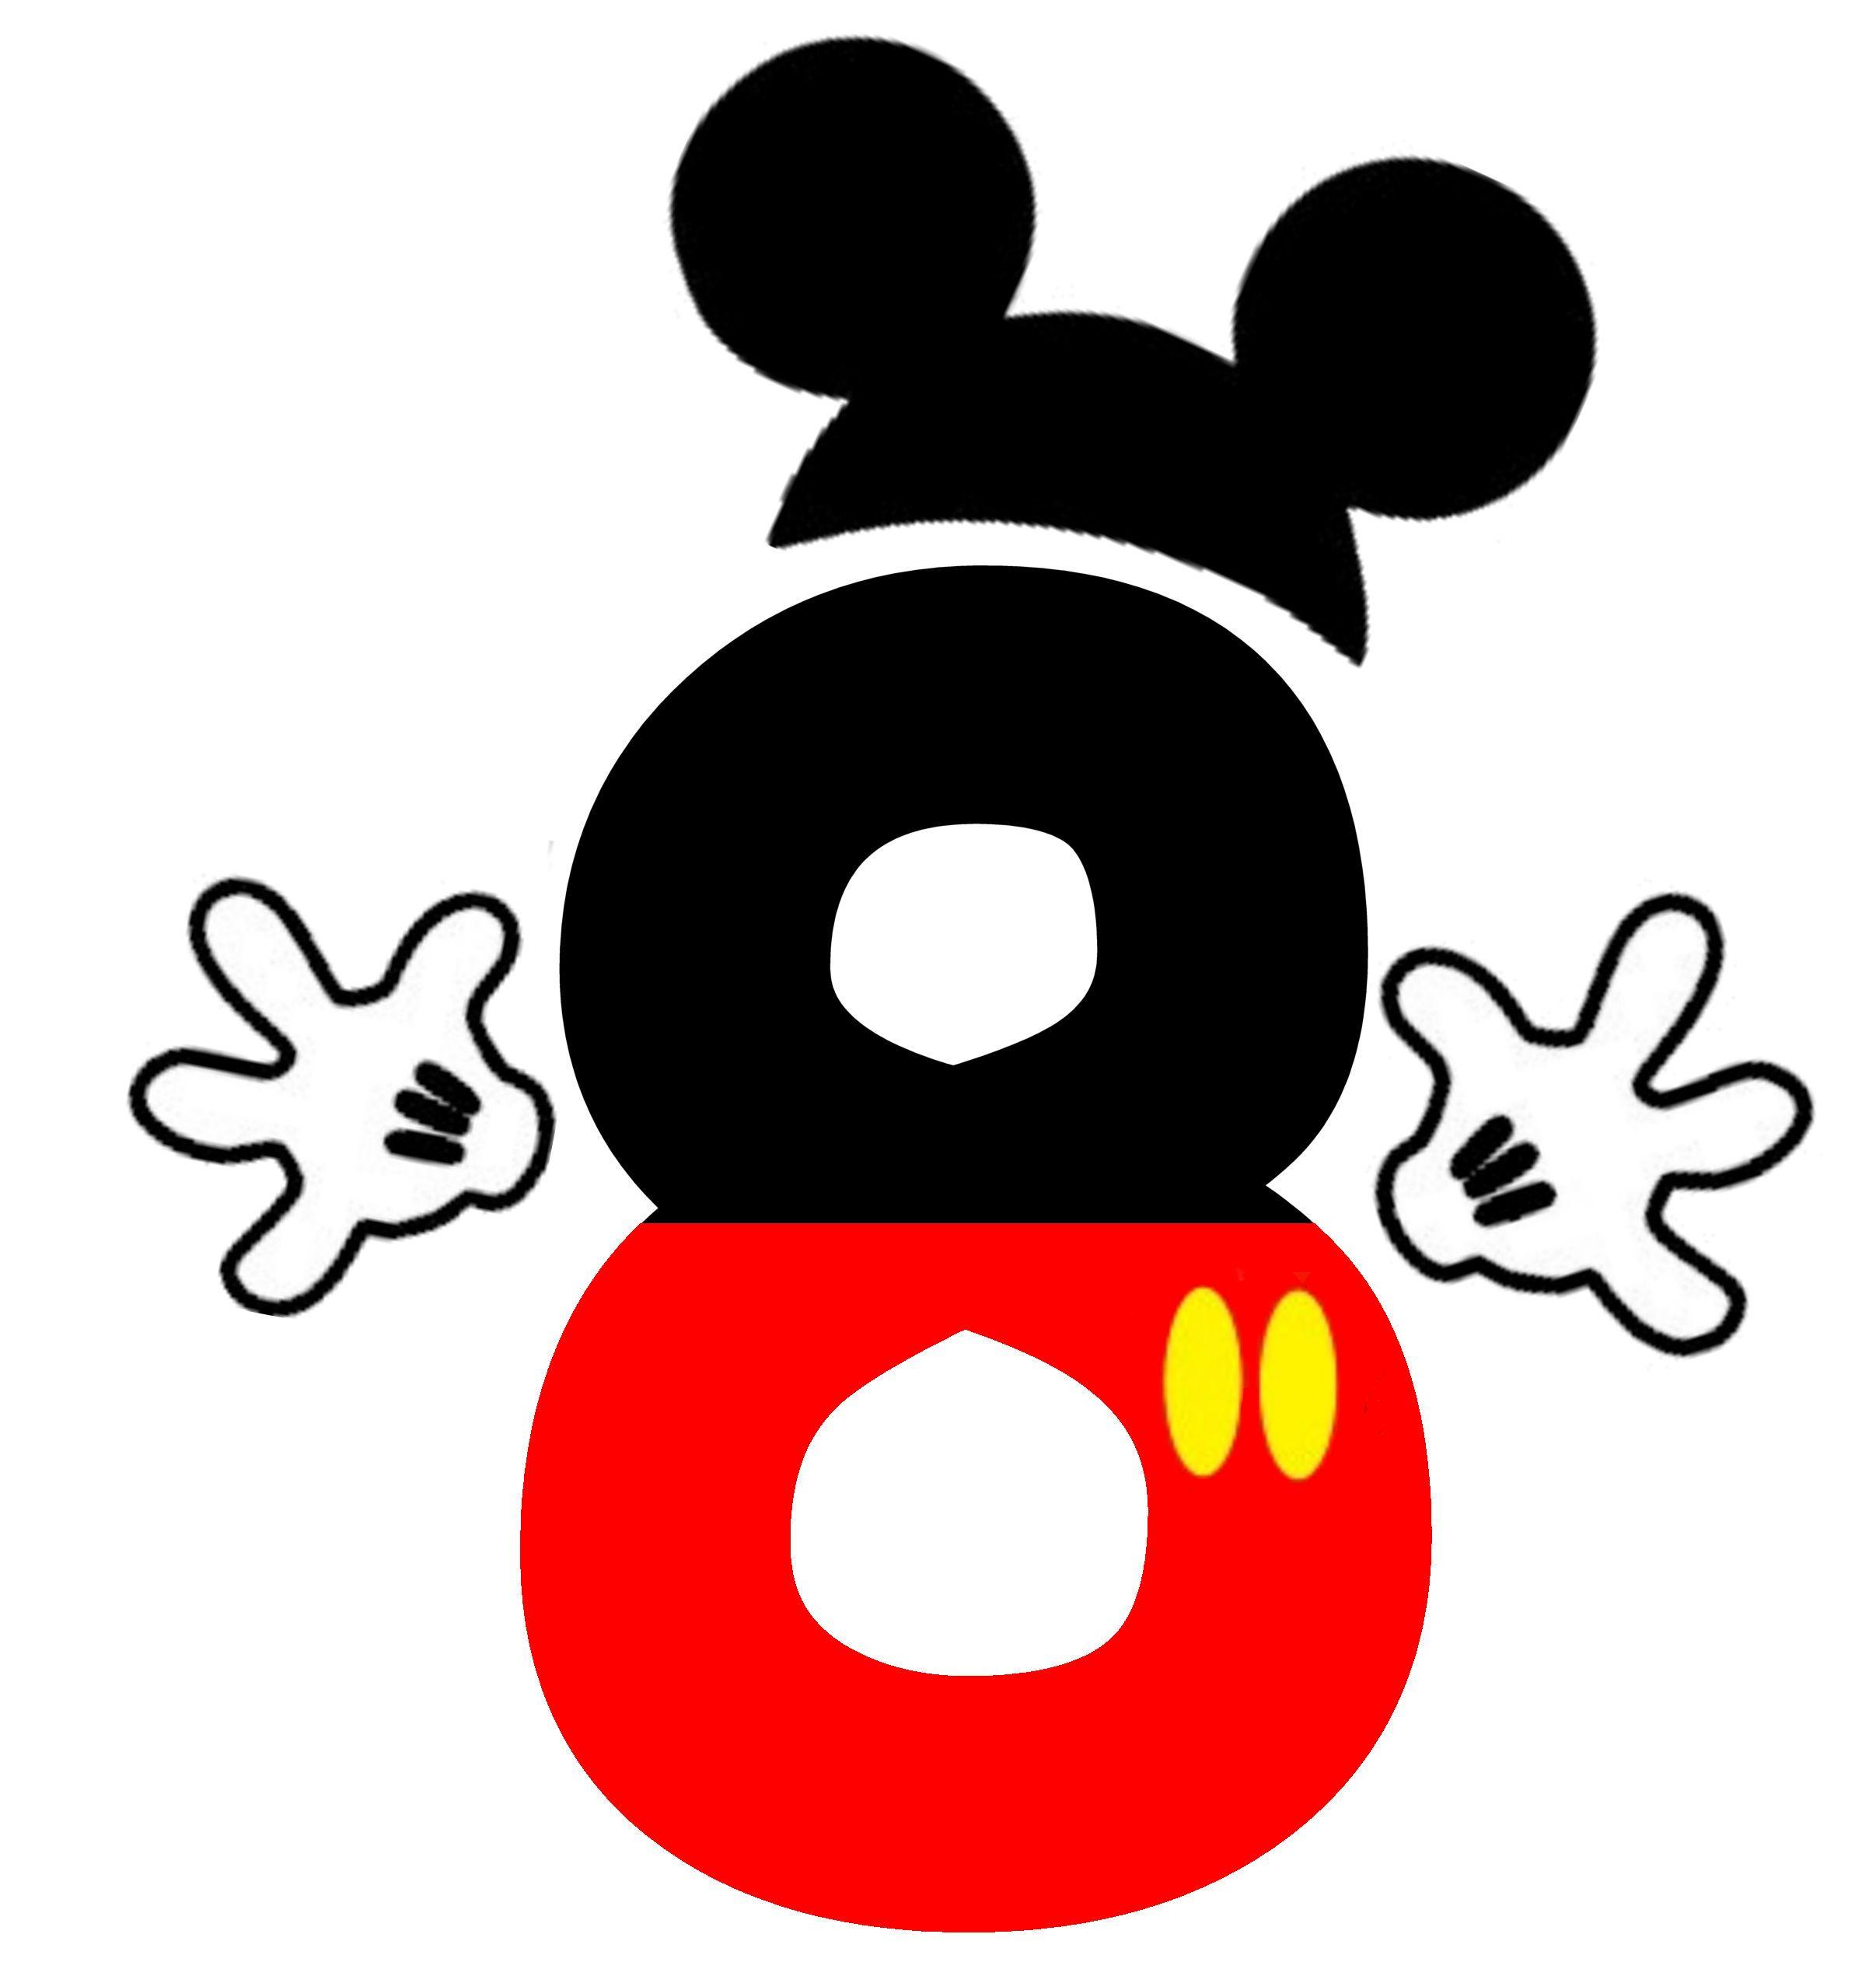 Mickey 8 clipart pinterest mice disney letters and clip art mickey 8 biocorpaavc